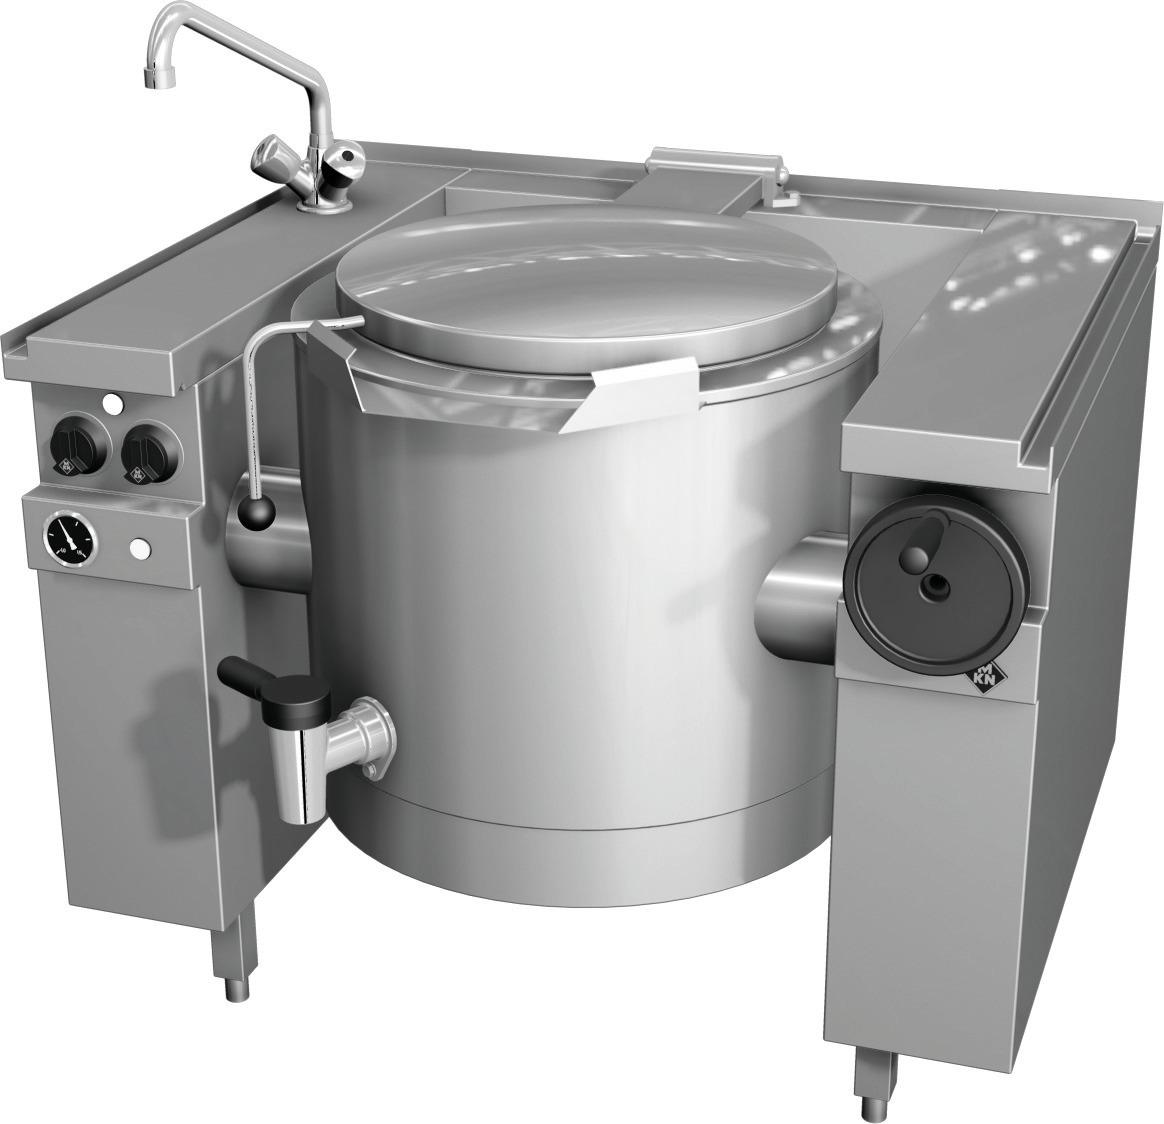 Elektro-Kipp-Schnellkochkessel 60,00 l Handkippung Vapro 1100 x 850 x 700 mm